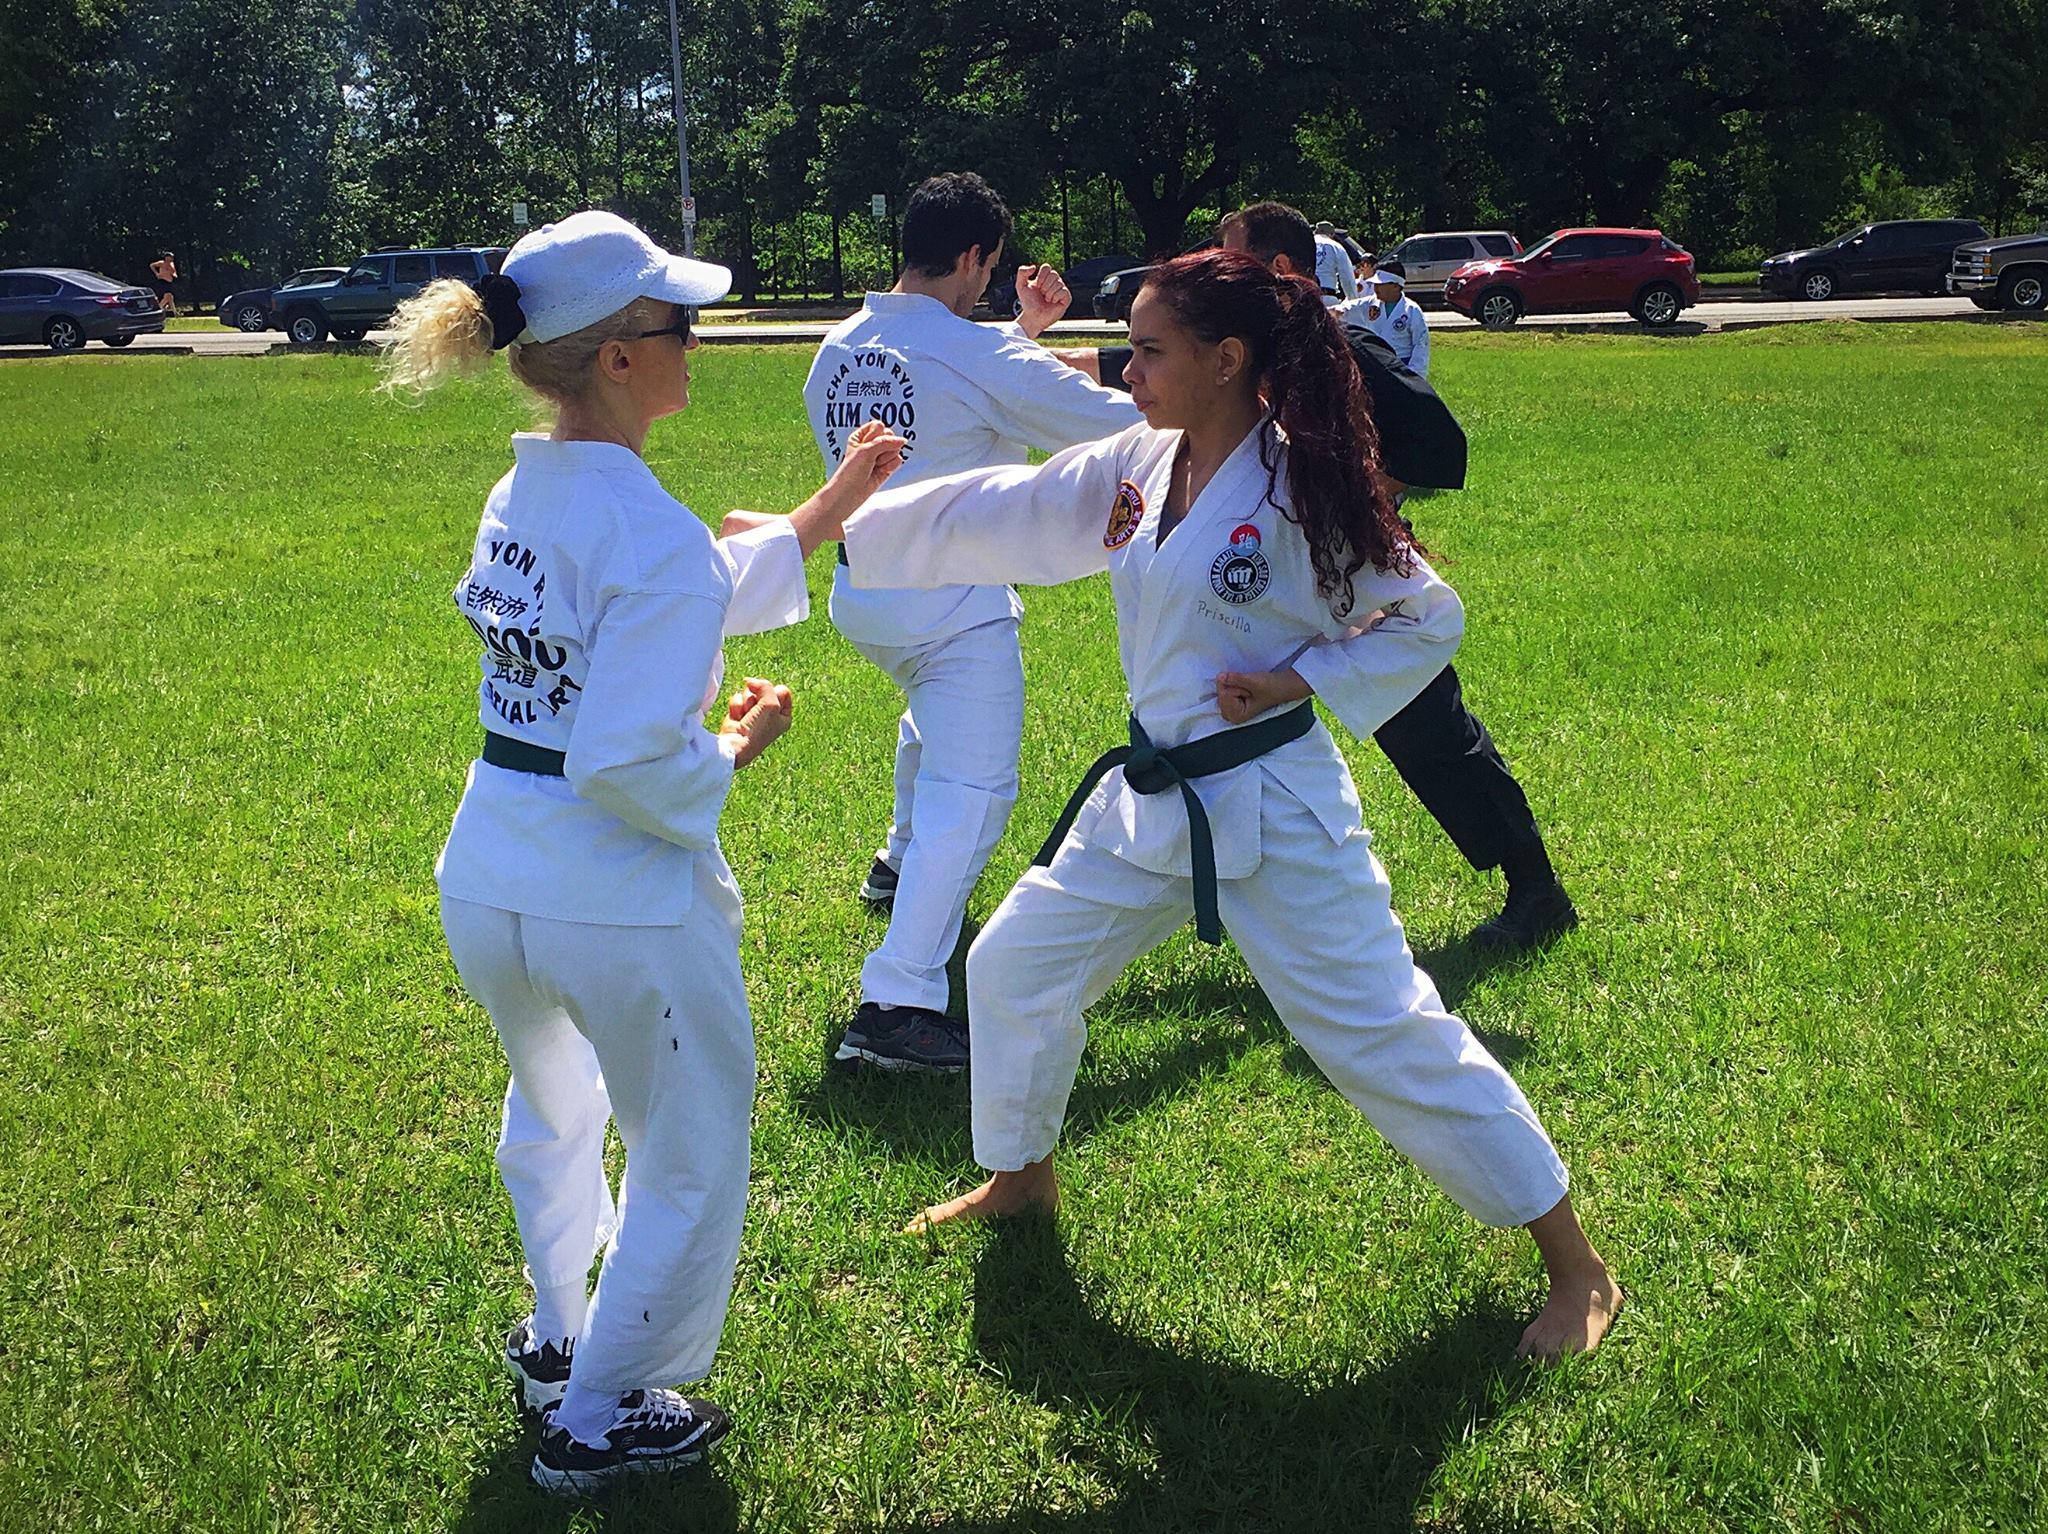 Outdoor Training at Memorial Park